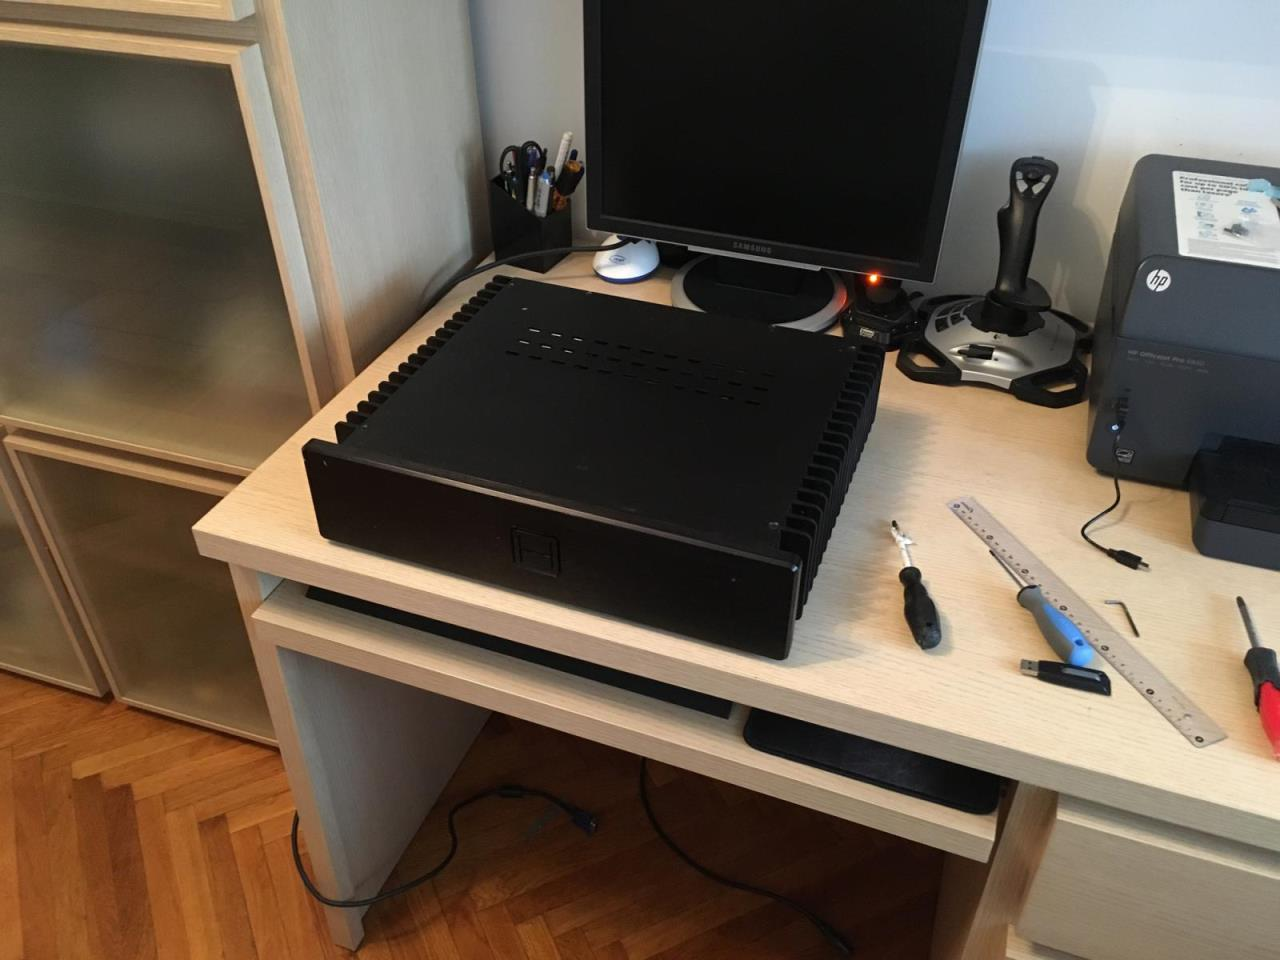 HDPLEX Fanless Computer Case